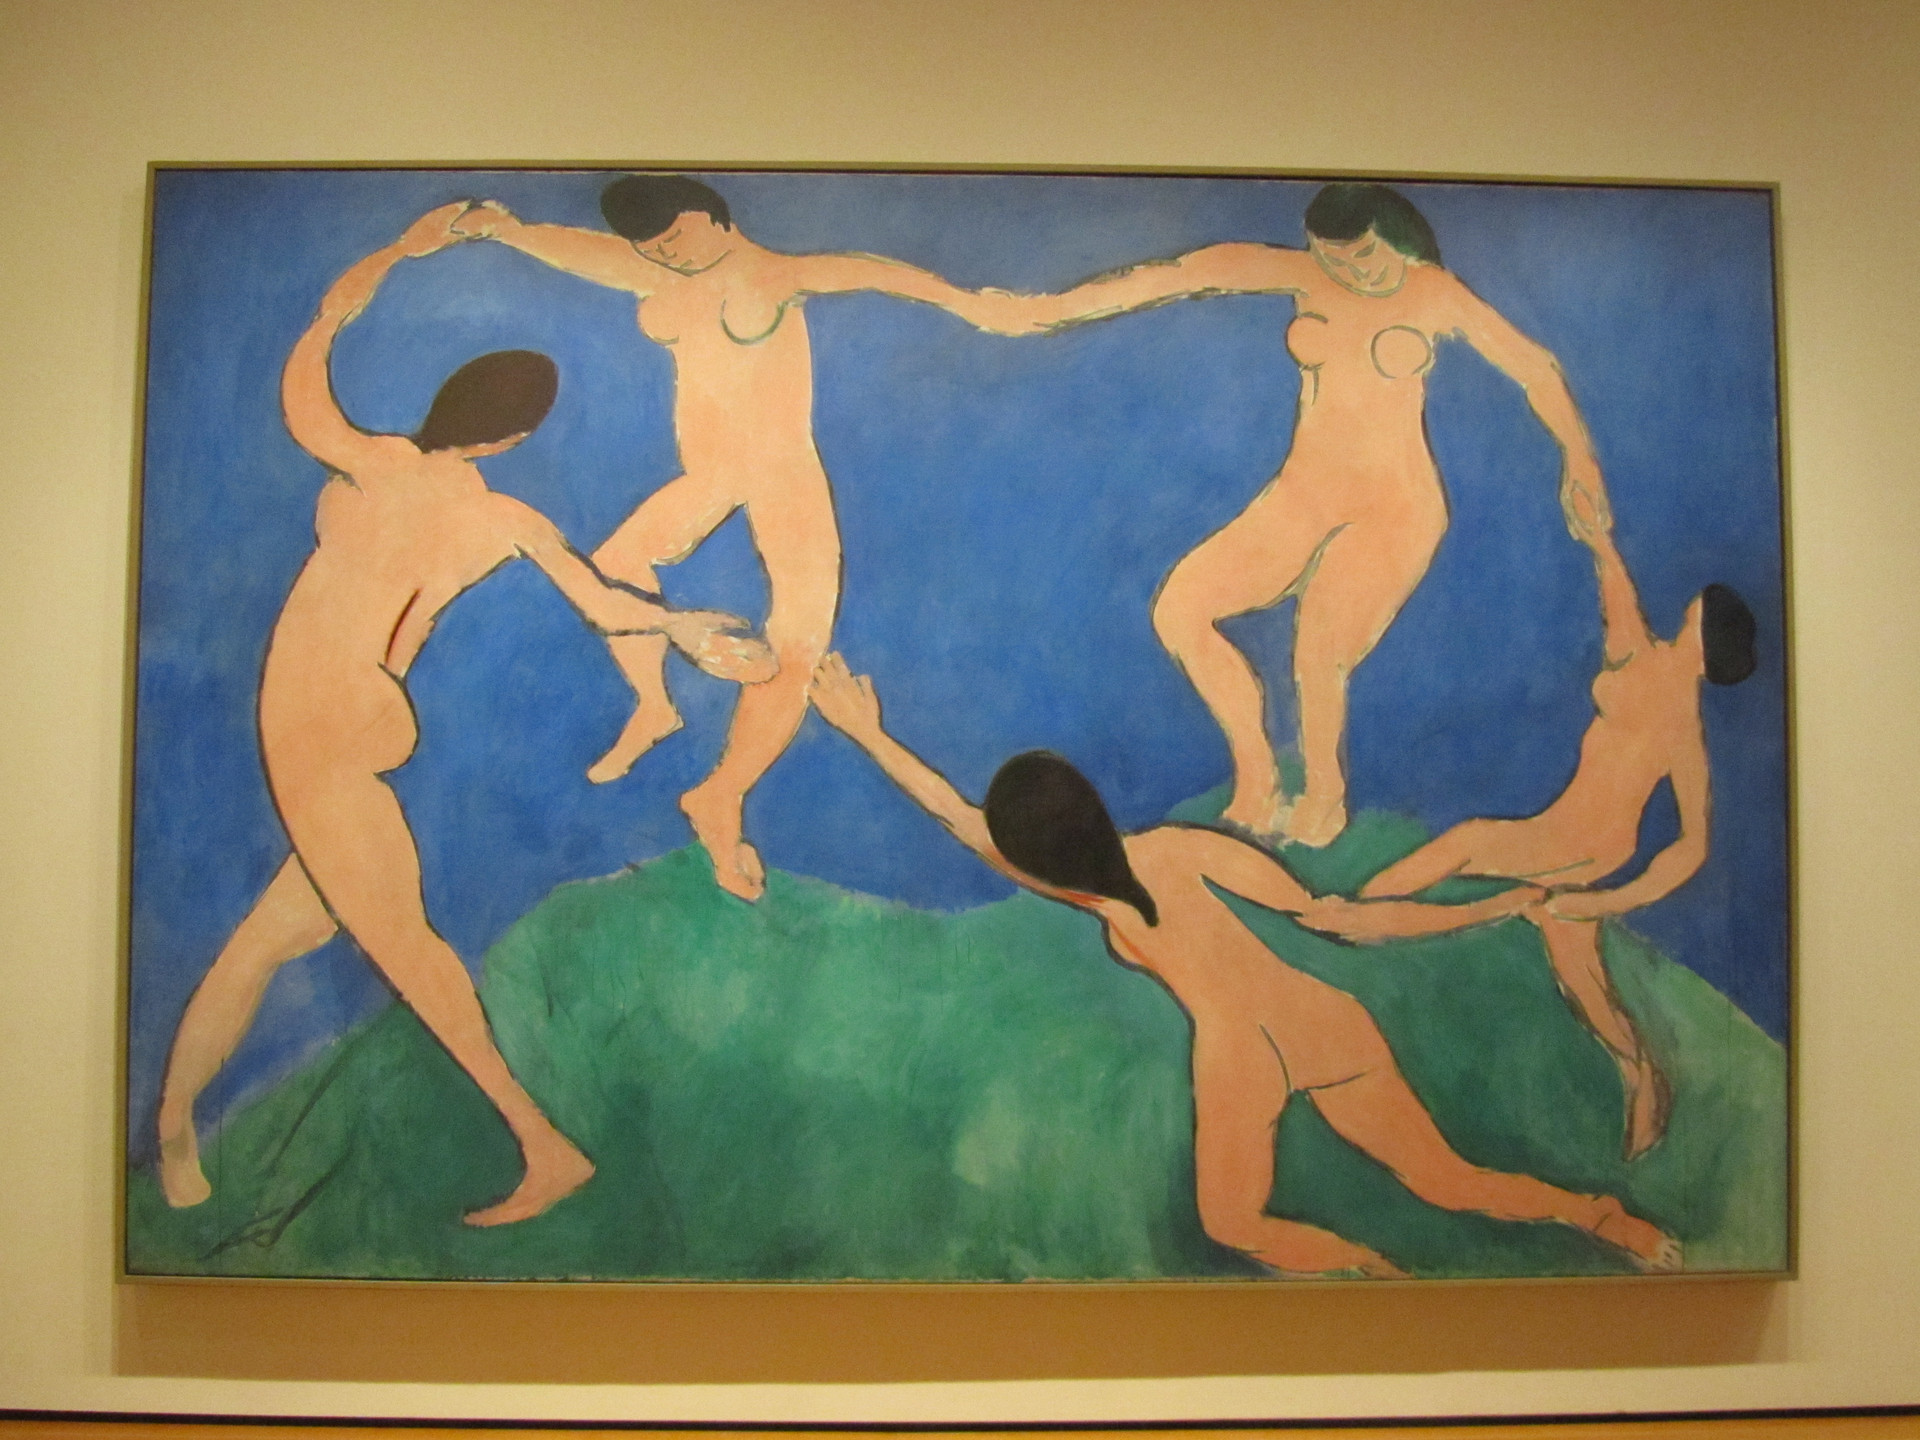 Henri Matisse - Dance I